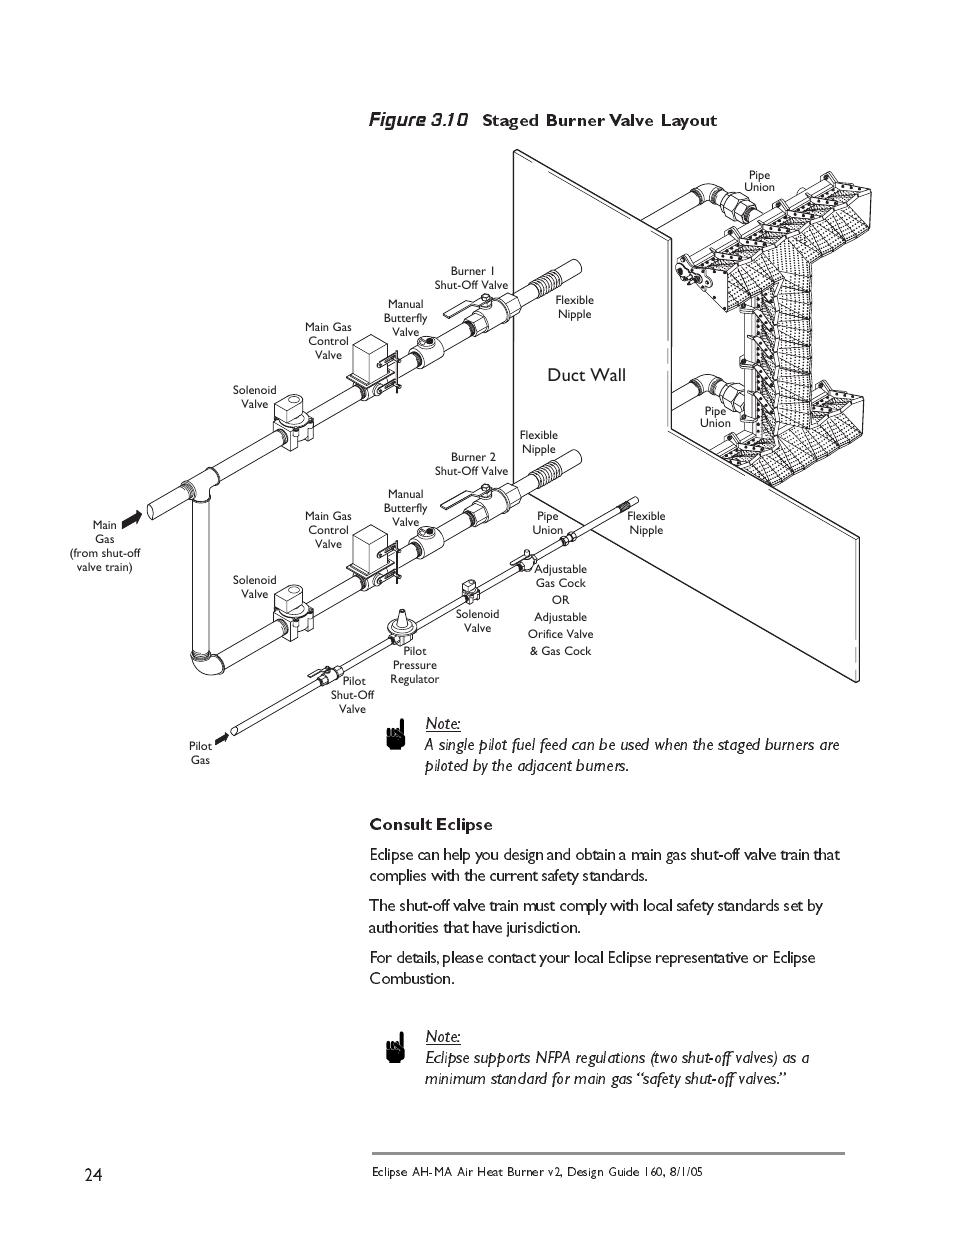 Manualguide Valvetrain Diagram Engine Valve Train Image Not Found Or Type Unknown